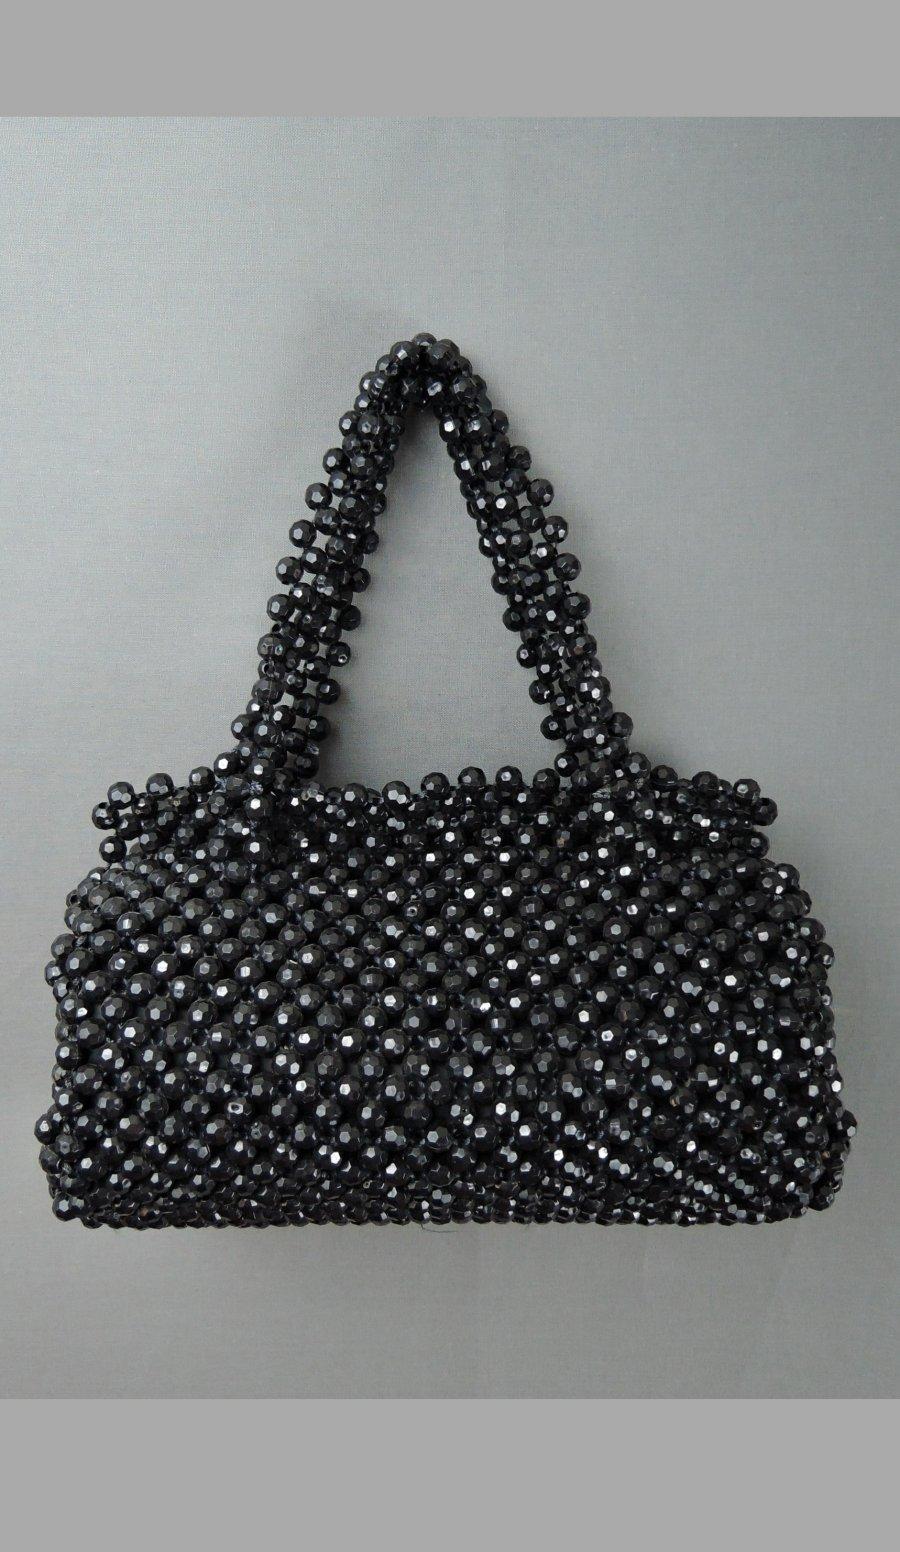 Vintage Black Plastic Beaded Purse, 9x4 inches 1960s Walborg